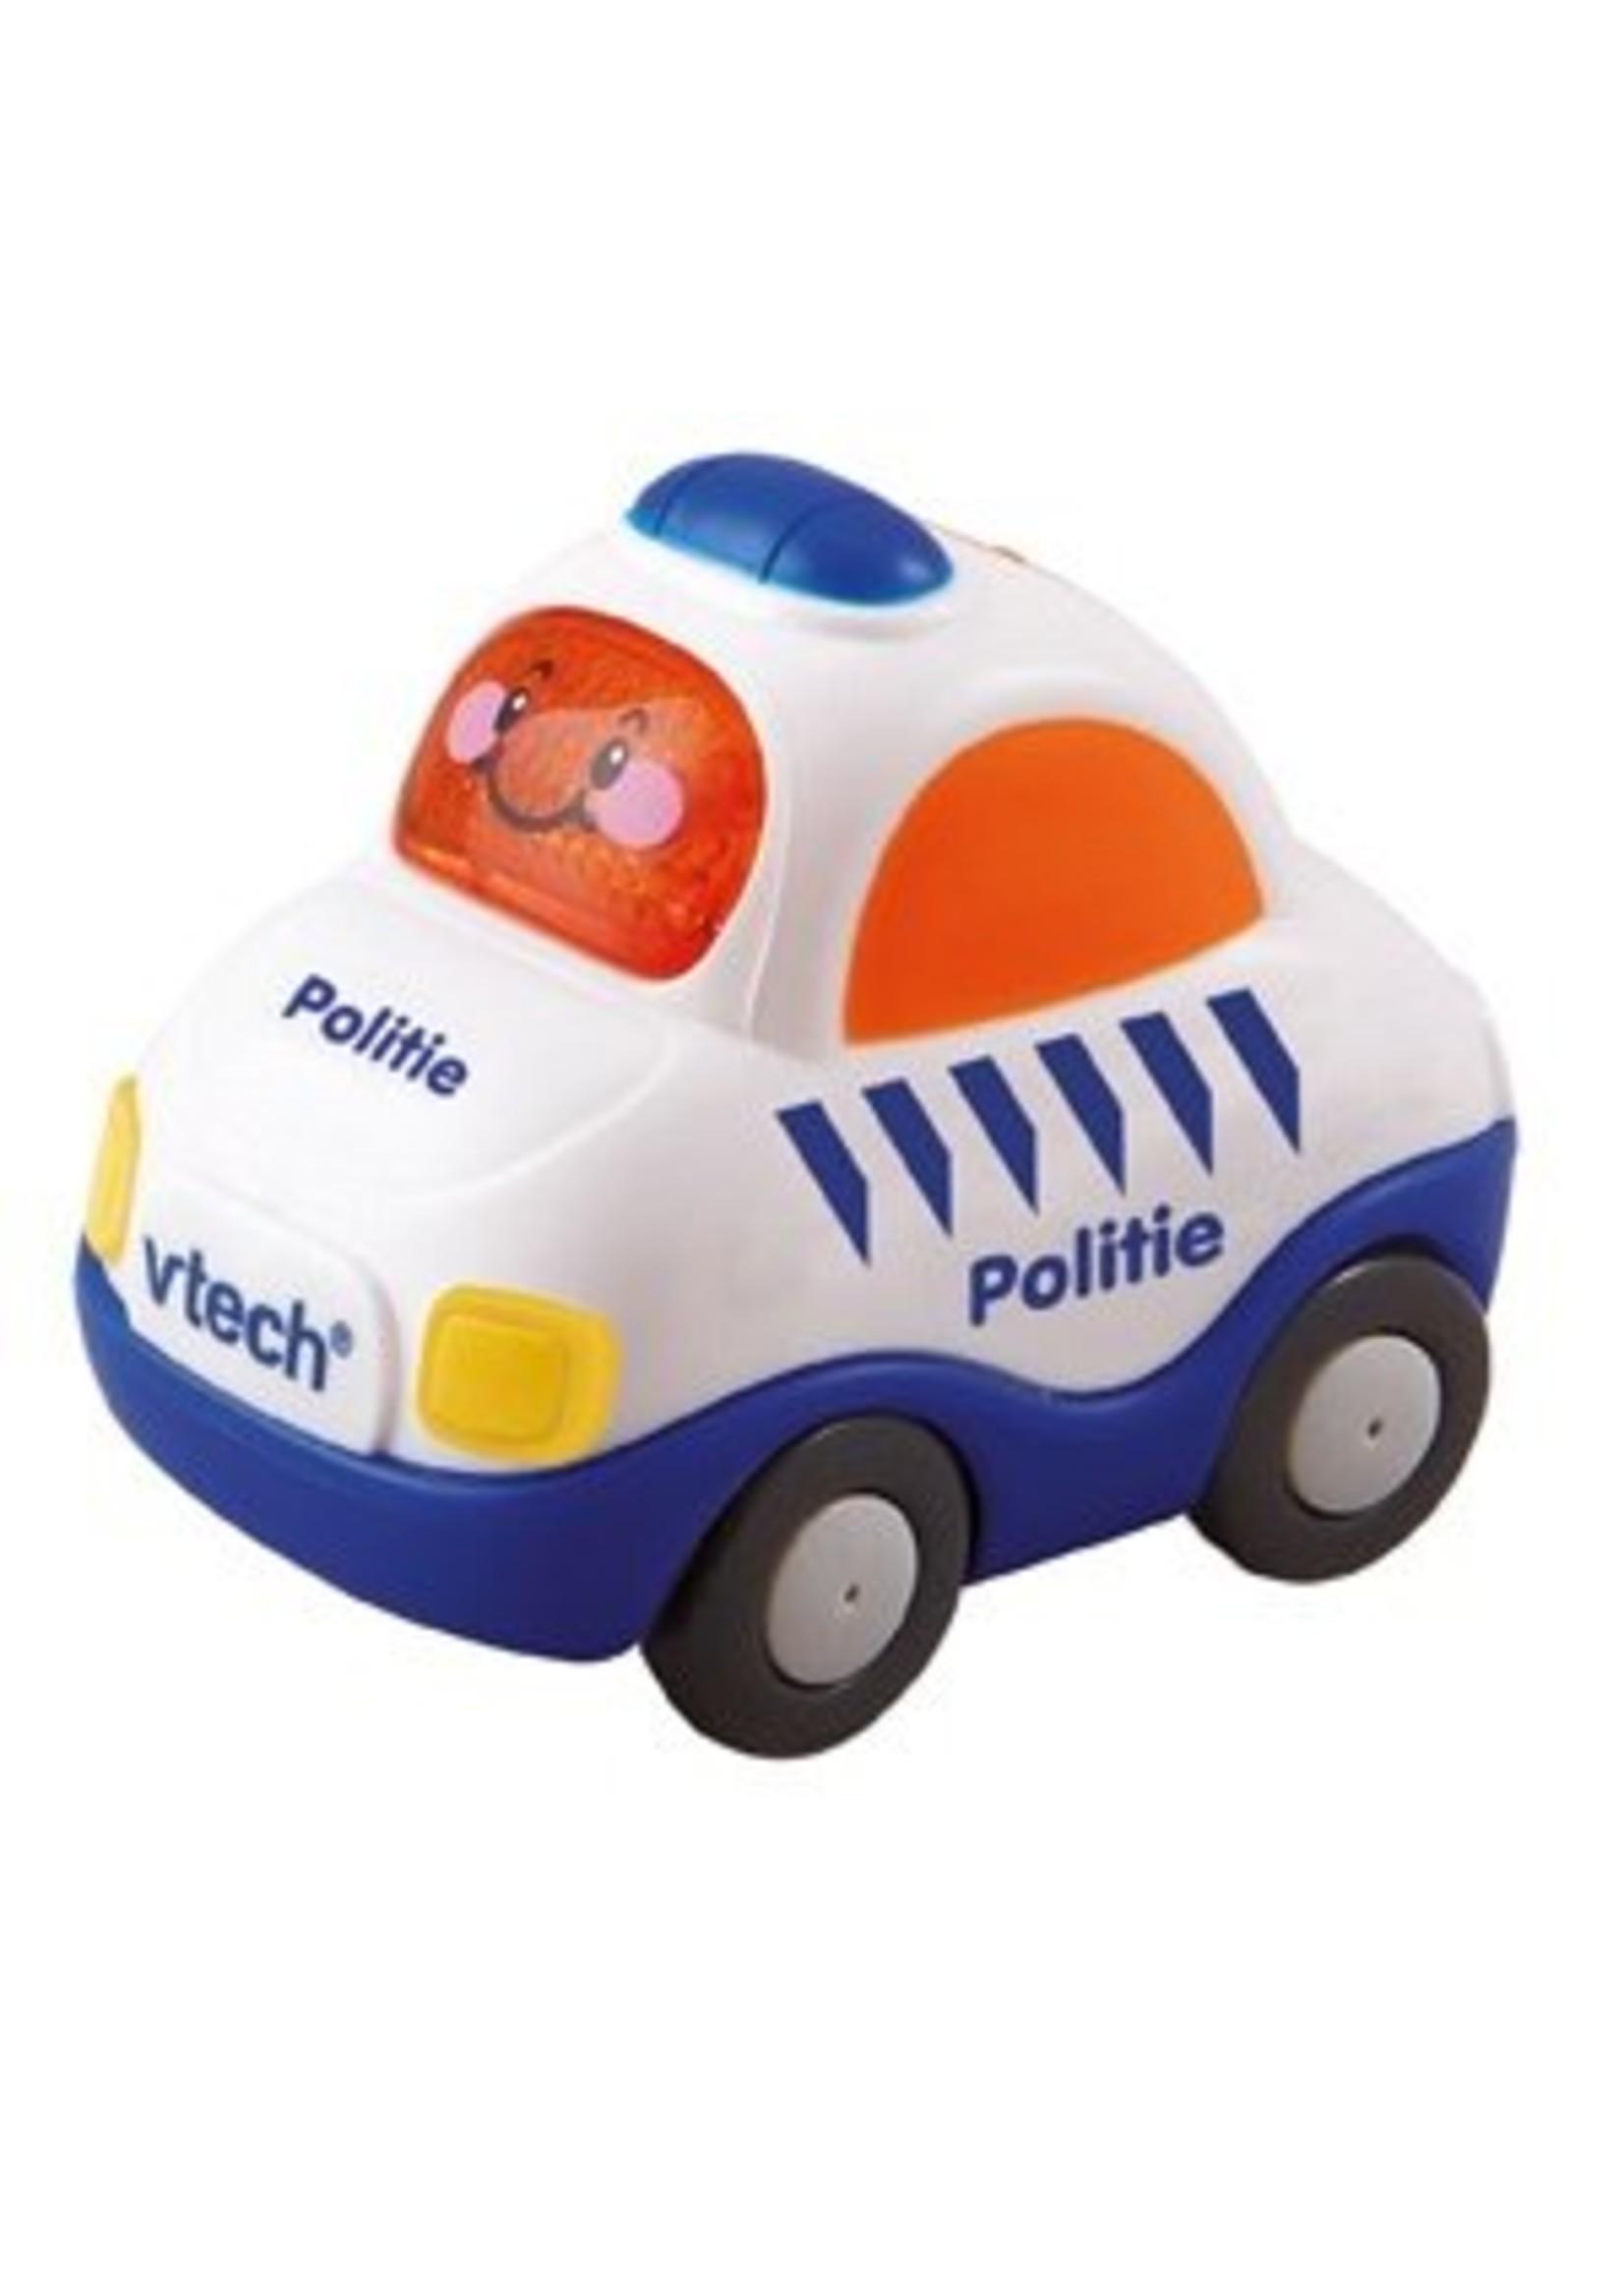 Vtech Toet Toet Auto's Politiebureau +12m